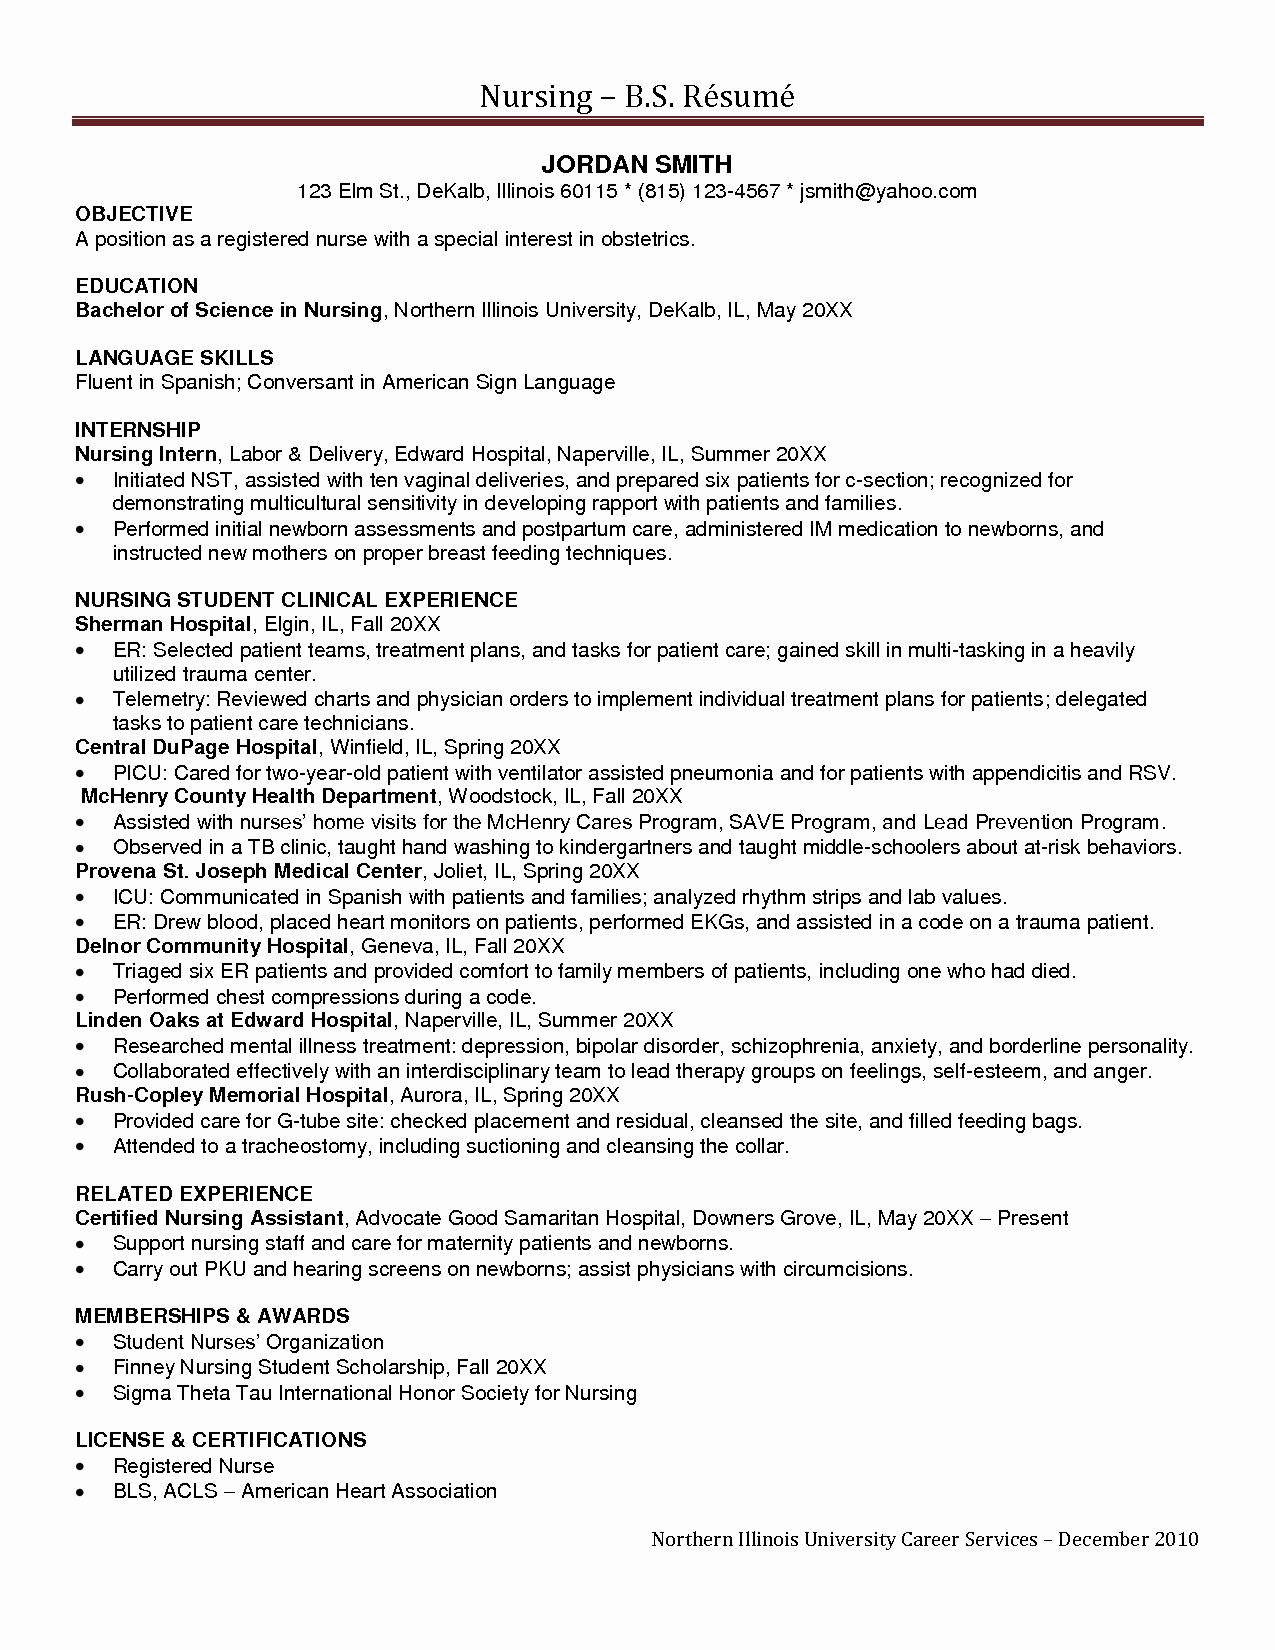 New Grad Rn Resume Objective Sidemcicek Examples